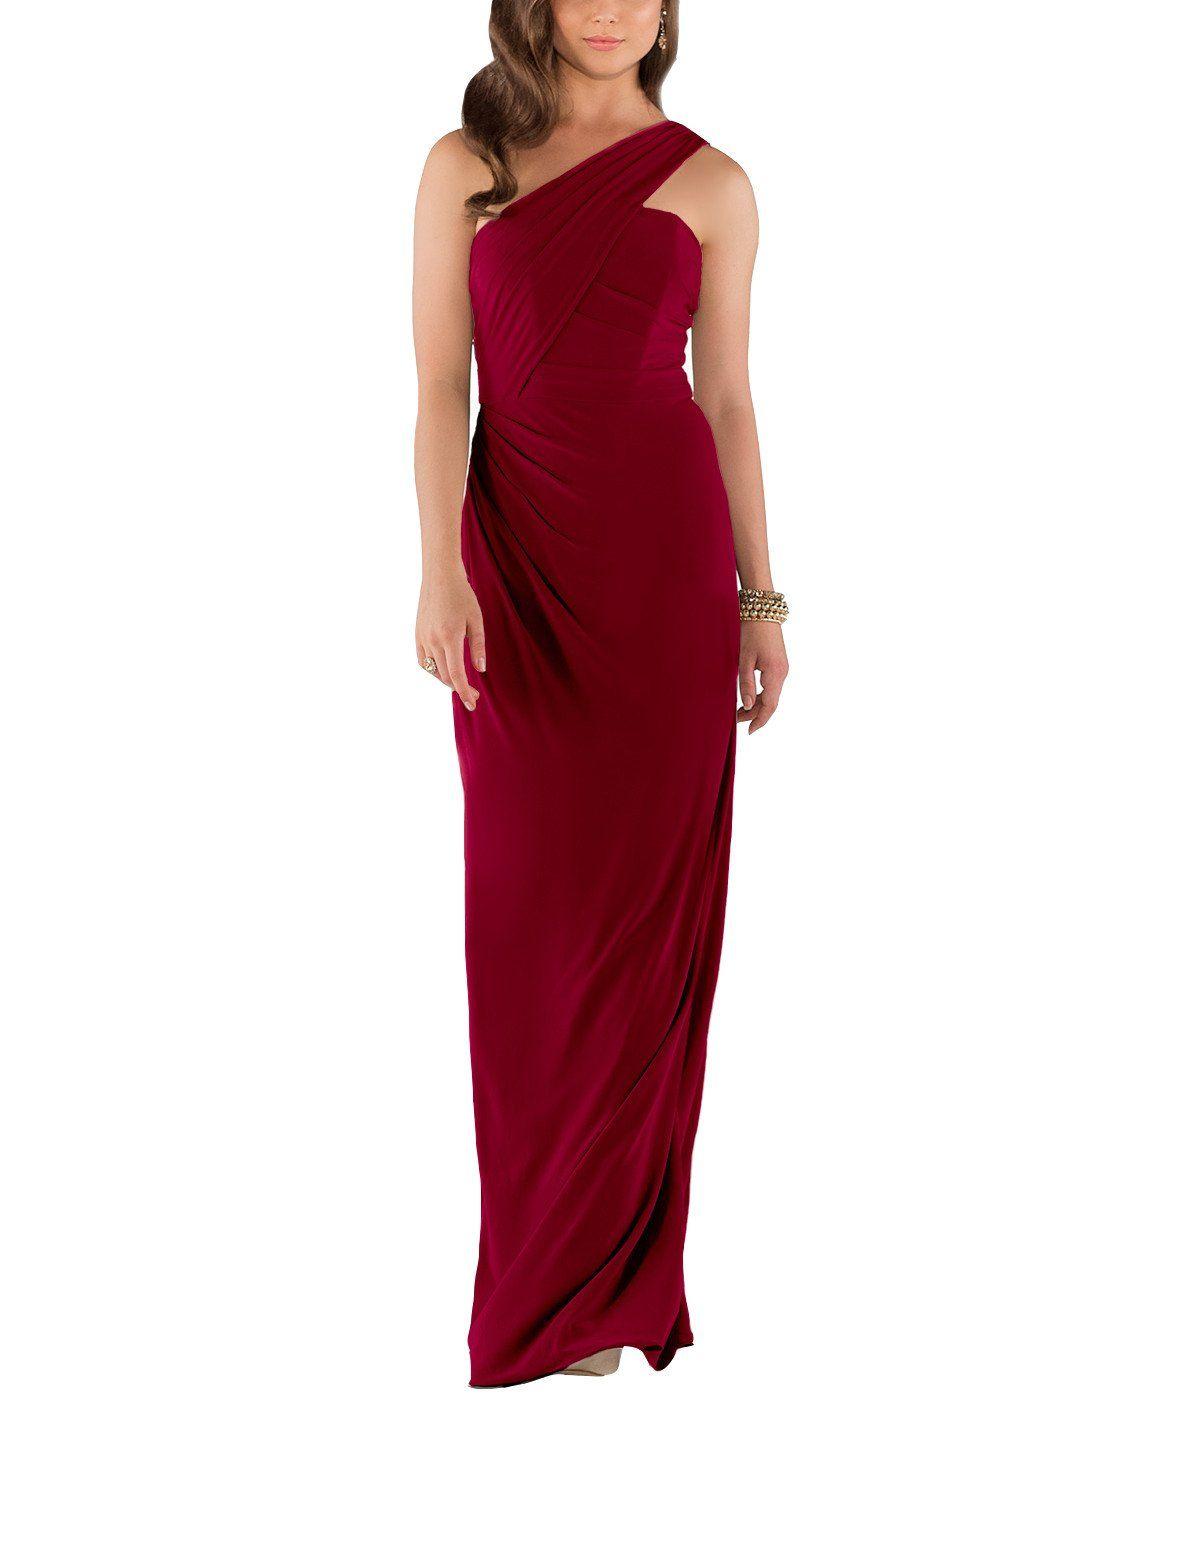 Sorella vita style red bridesmaid dresses pinterest